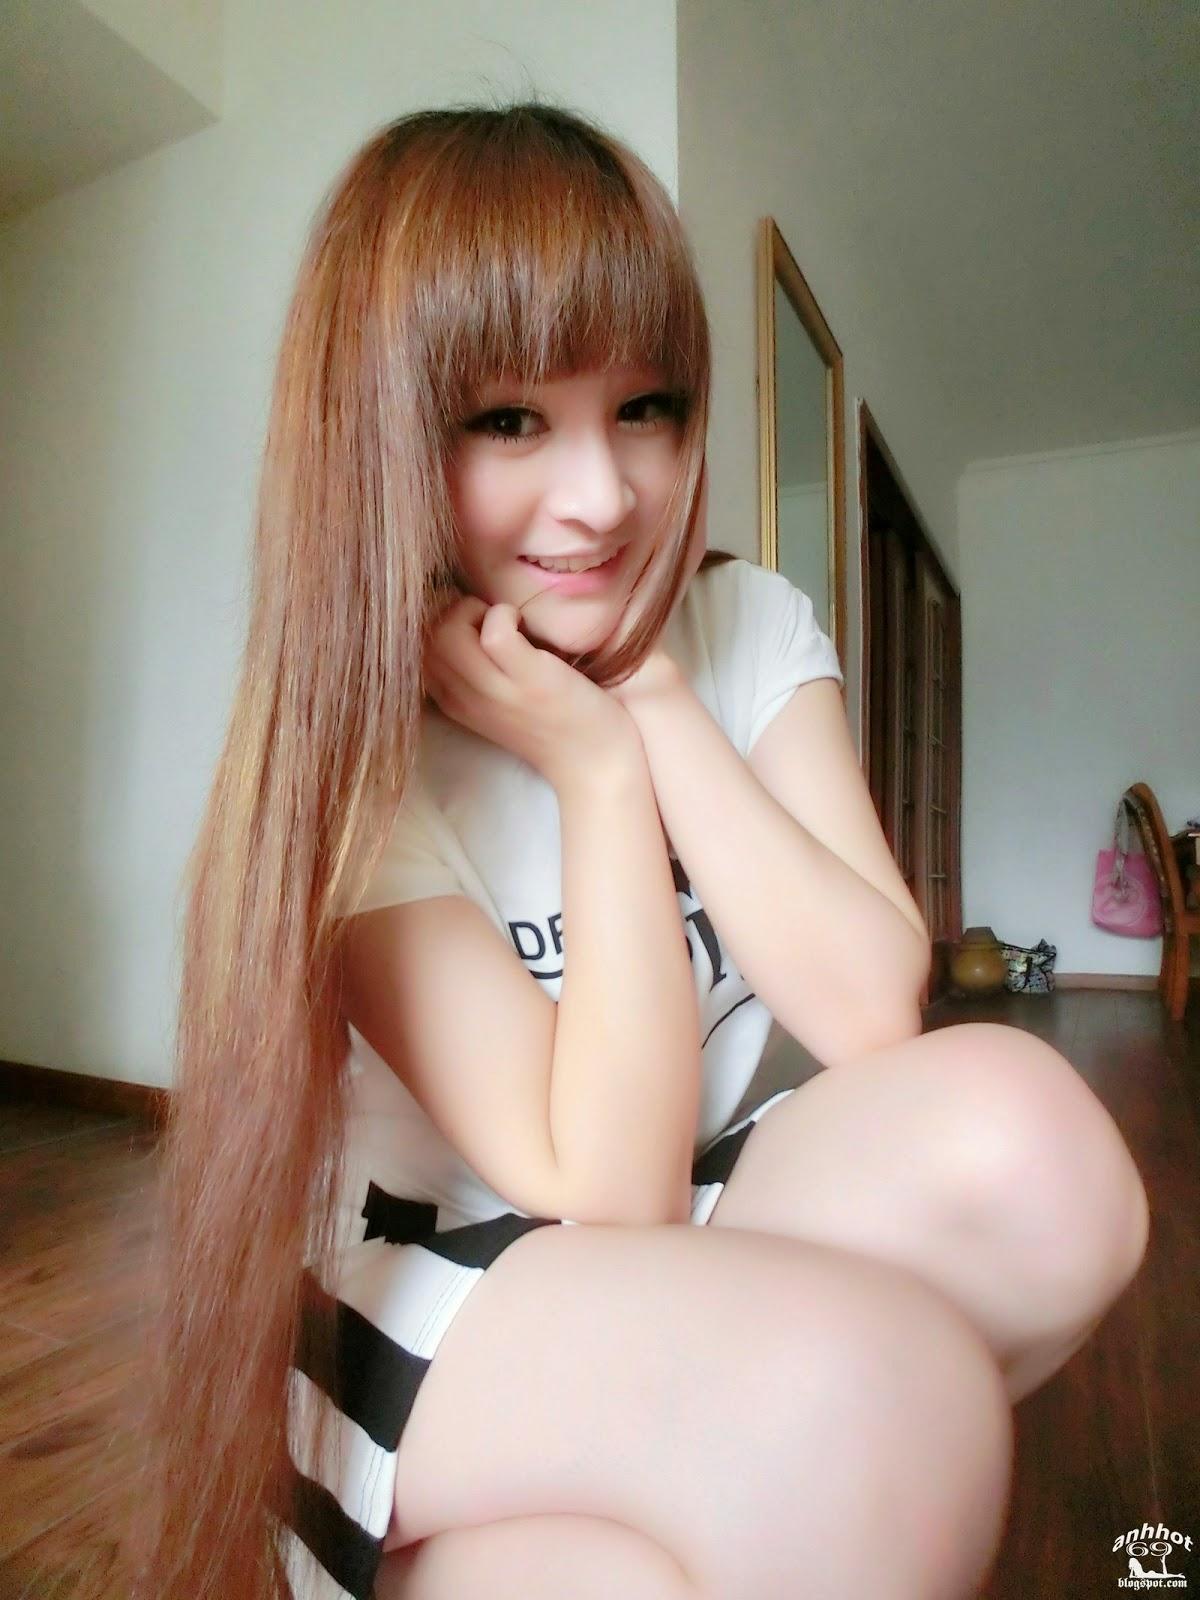 Suxia_h5_117491759176ab06a4o